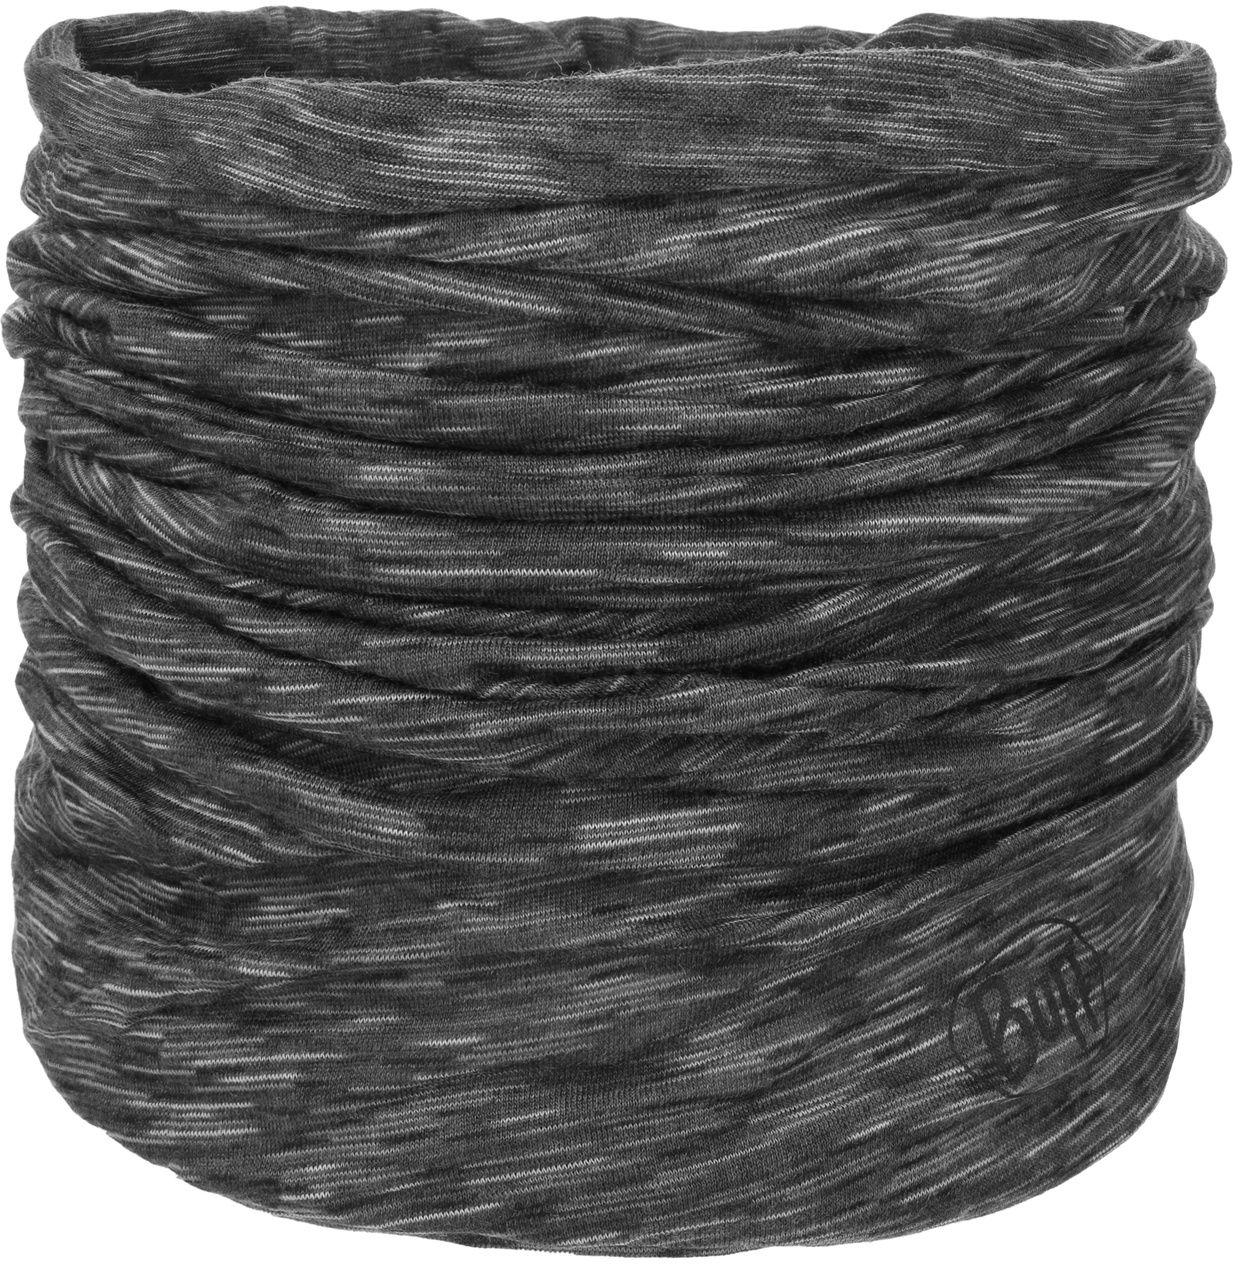 Merino Shale Grey Multifunctional Bandana by BUFF, antracytowy, One Size